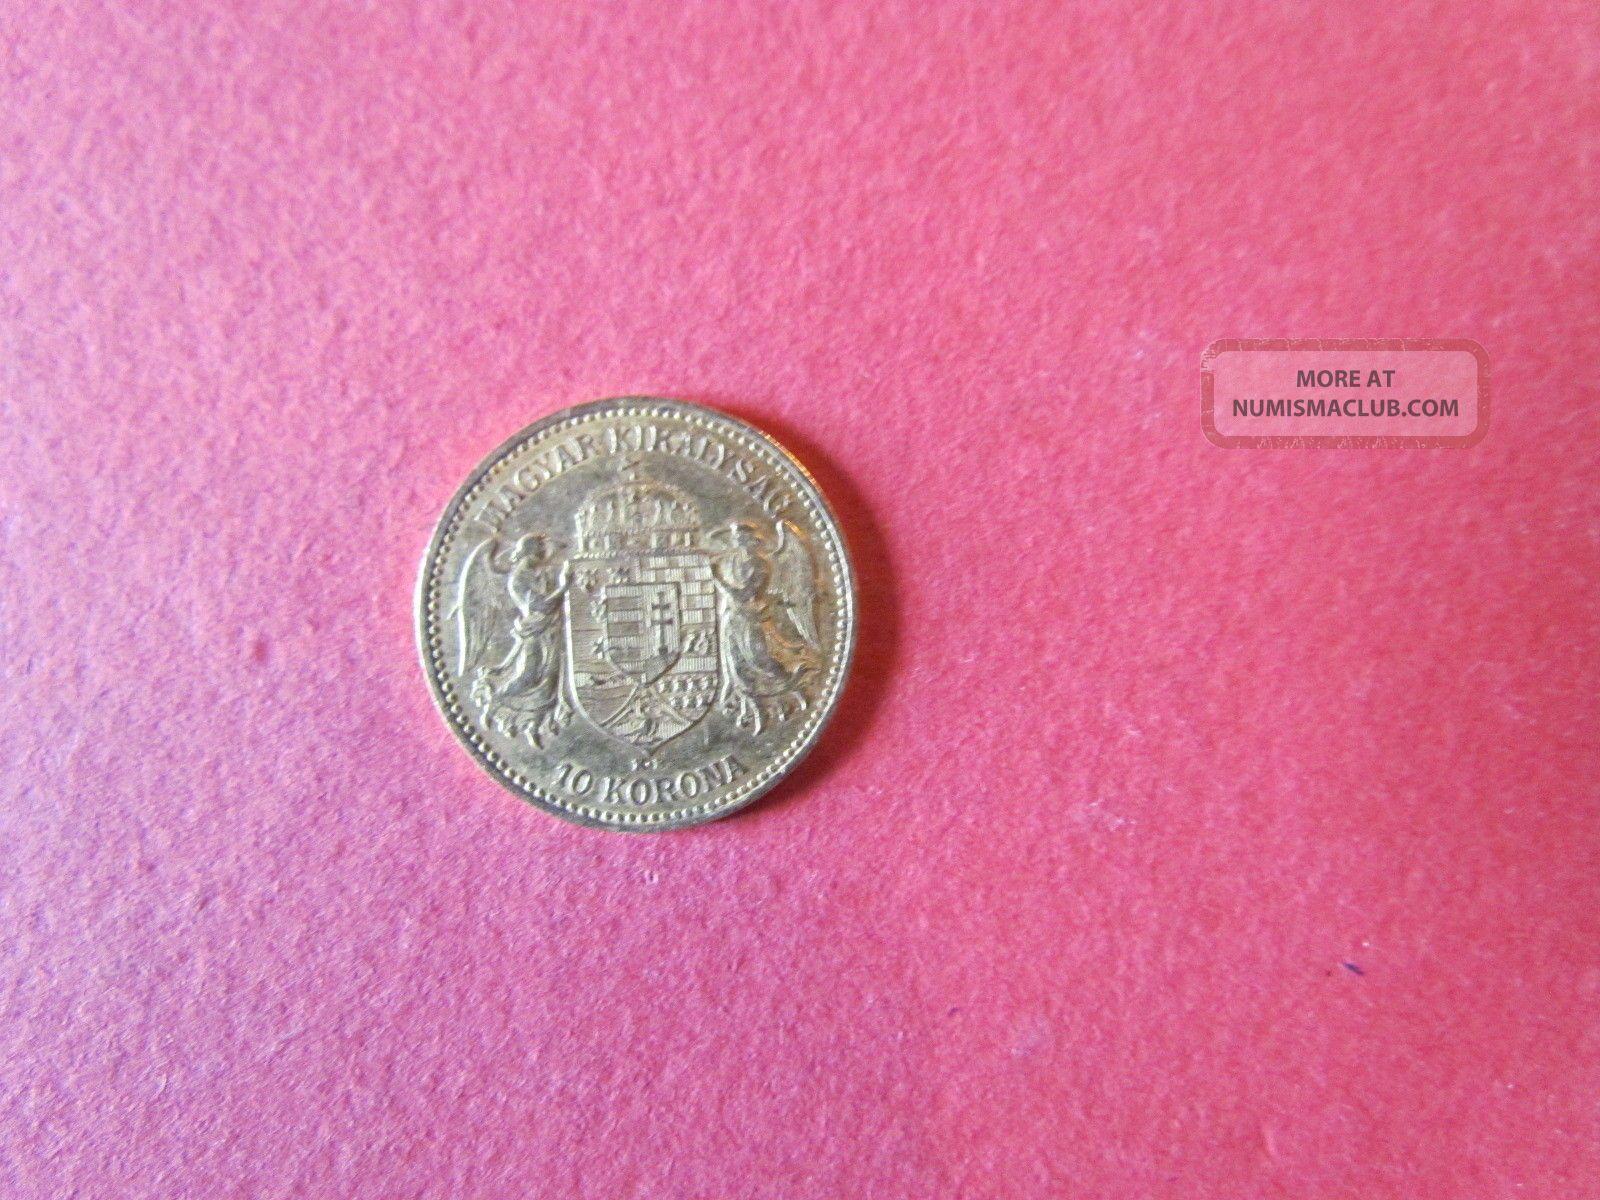 Hungary Gold Coin 10 Korona 1892 Gold Europe photo